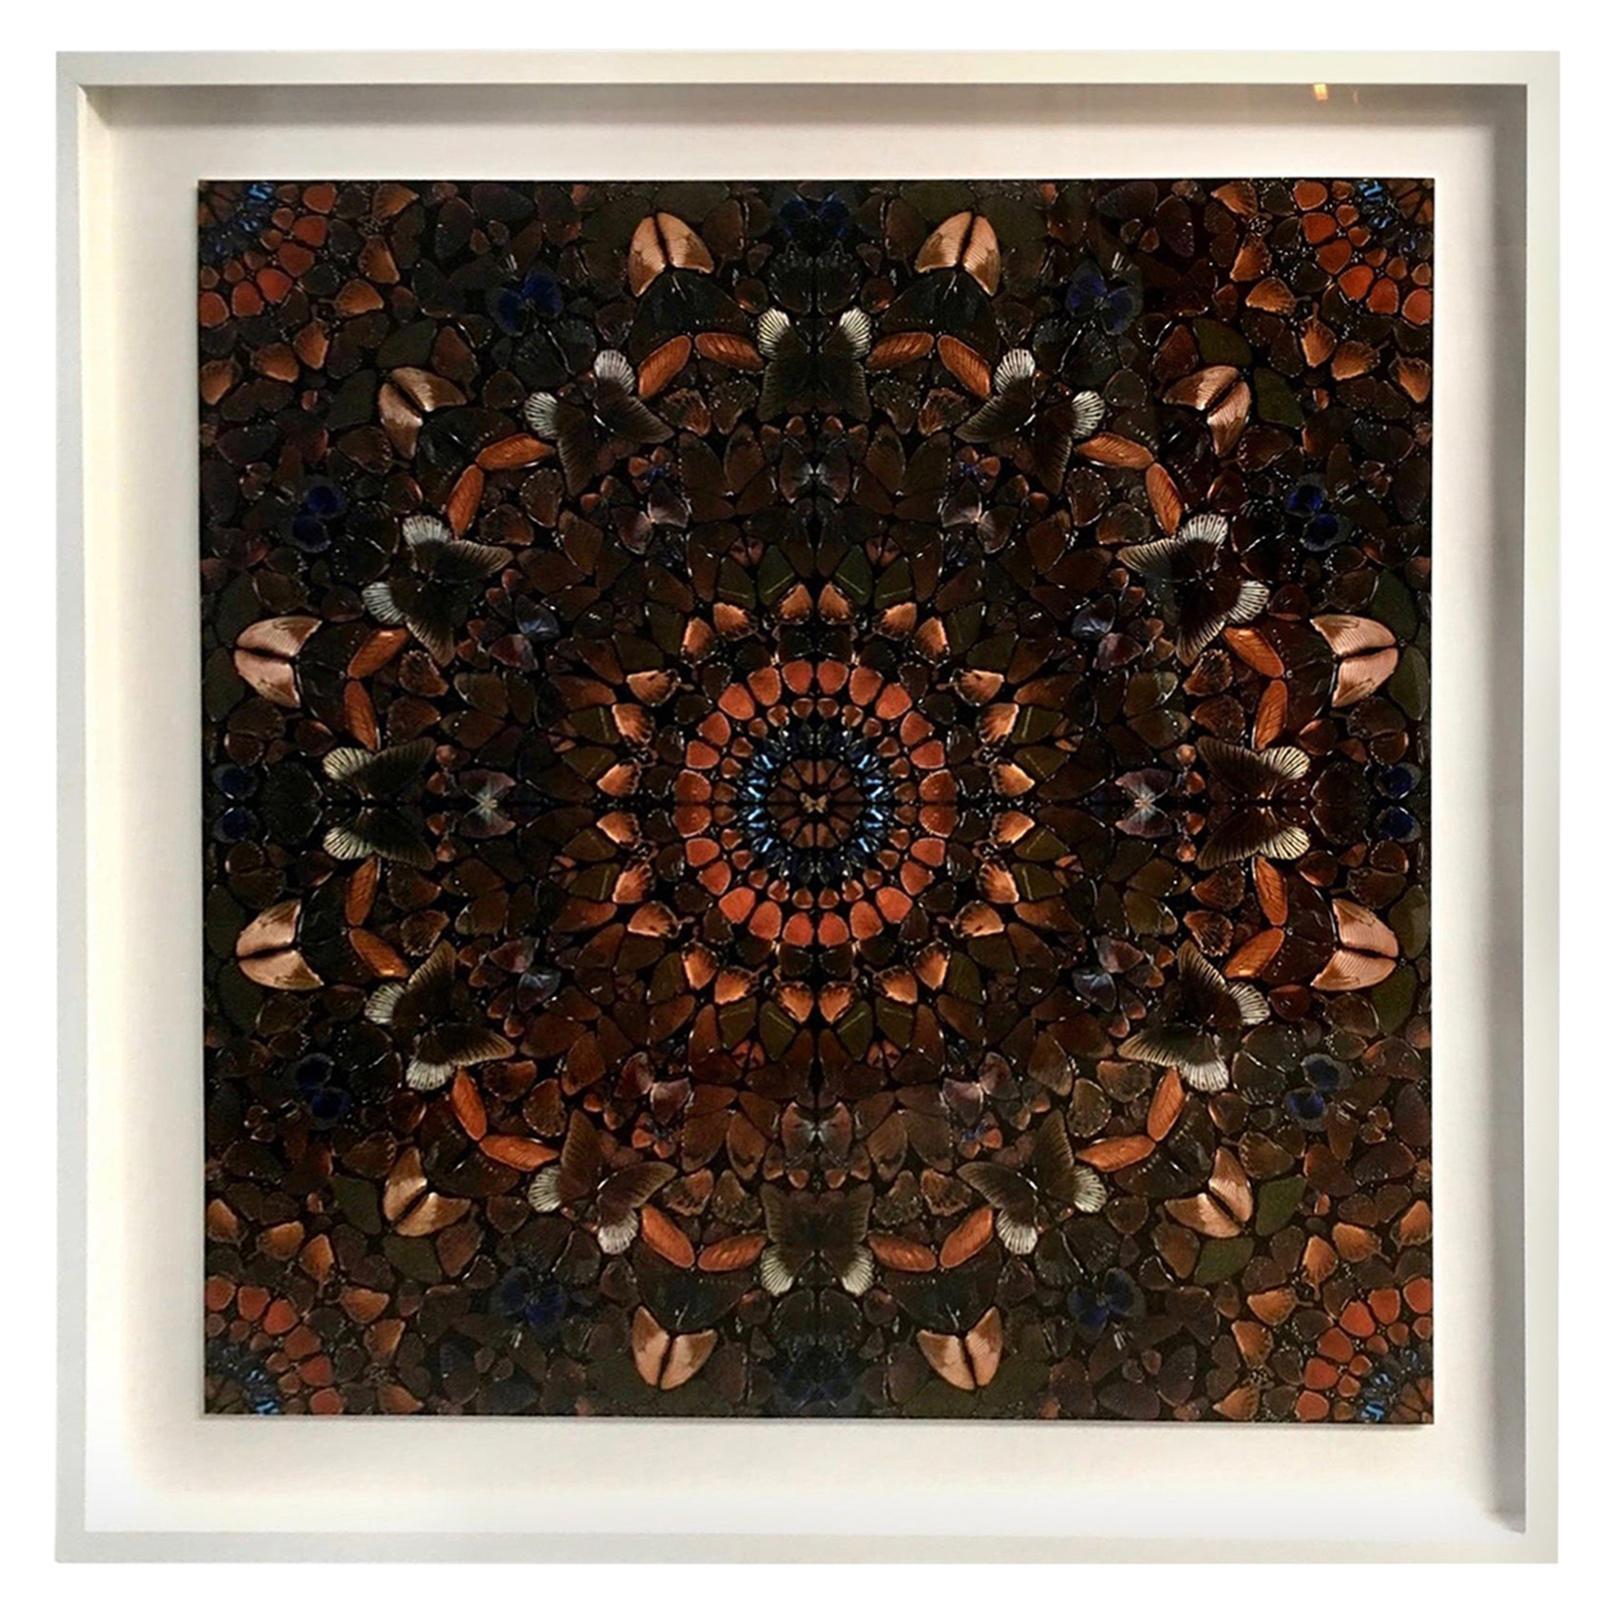 Damien Hirst Butterfly Wallpaper